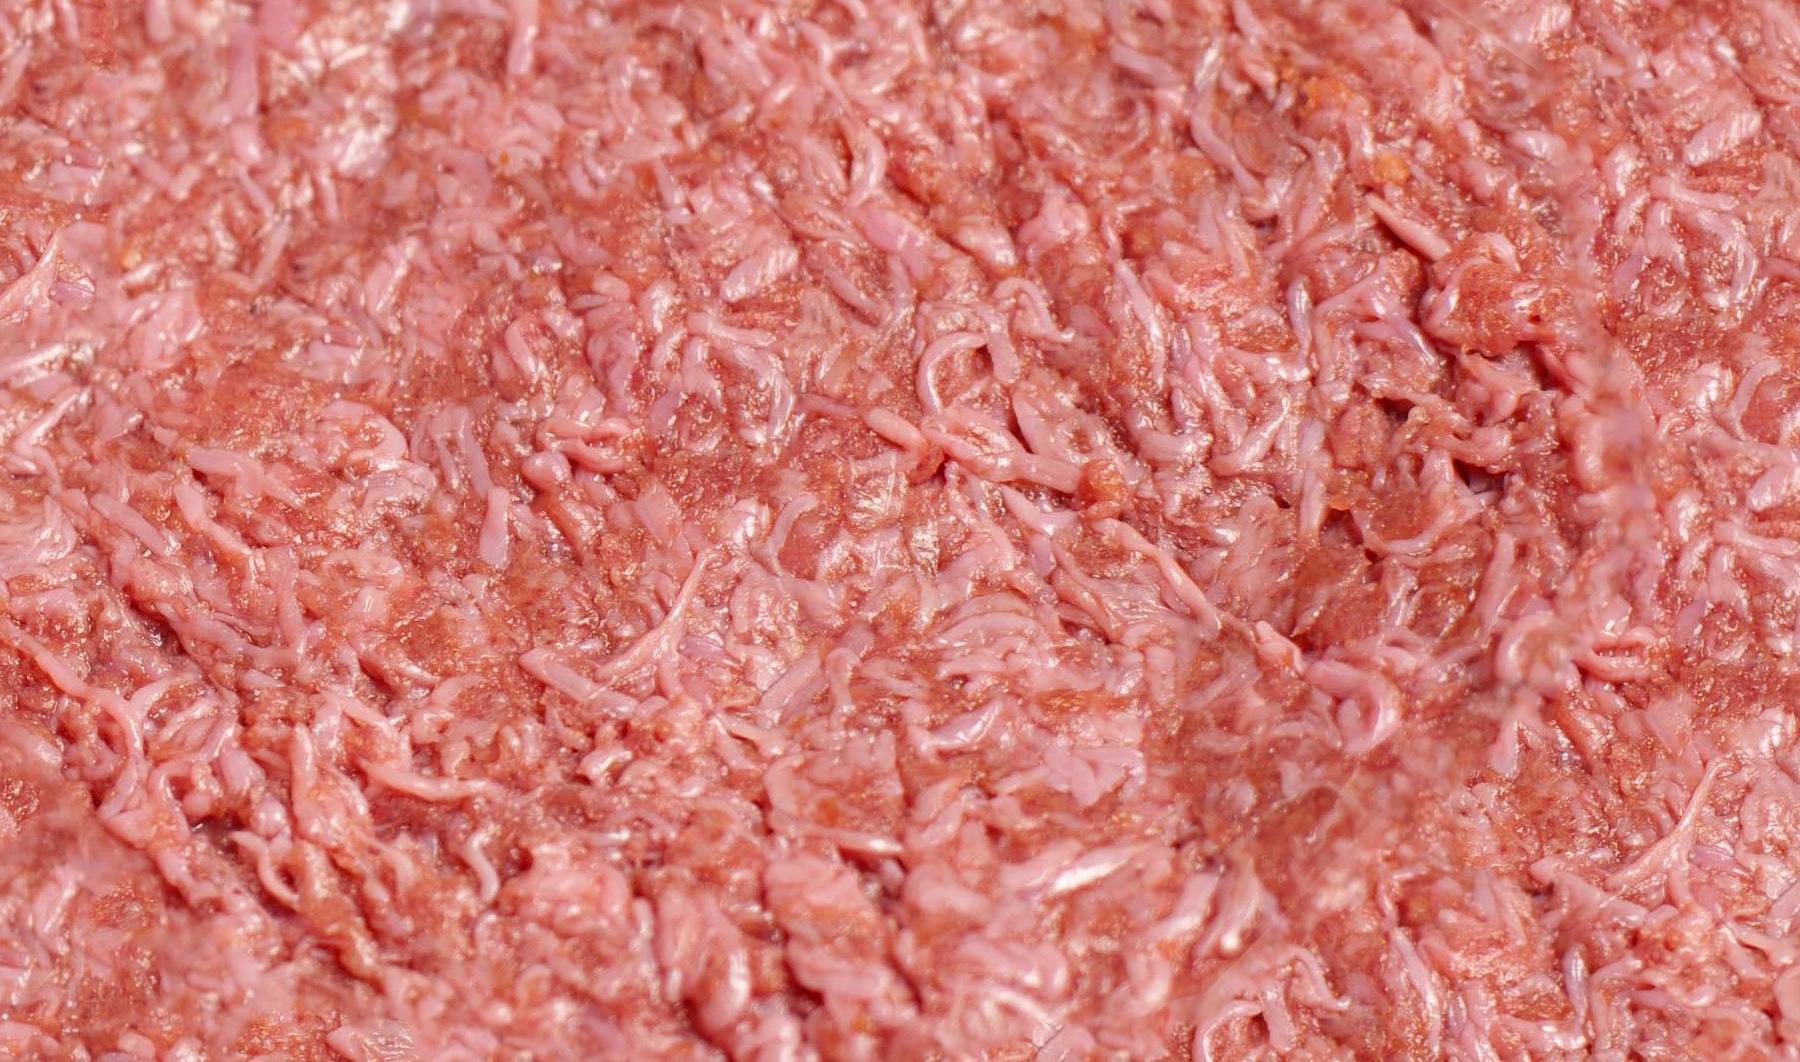 Lab-grown meat is inevitable. Will we eat it?